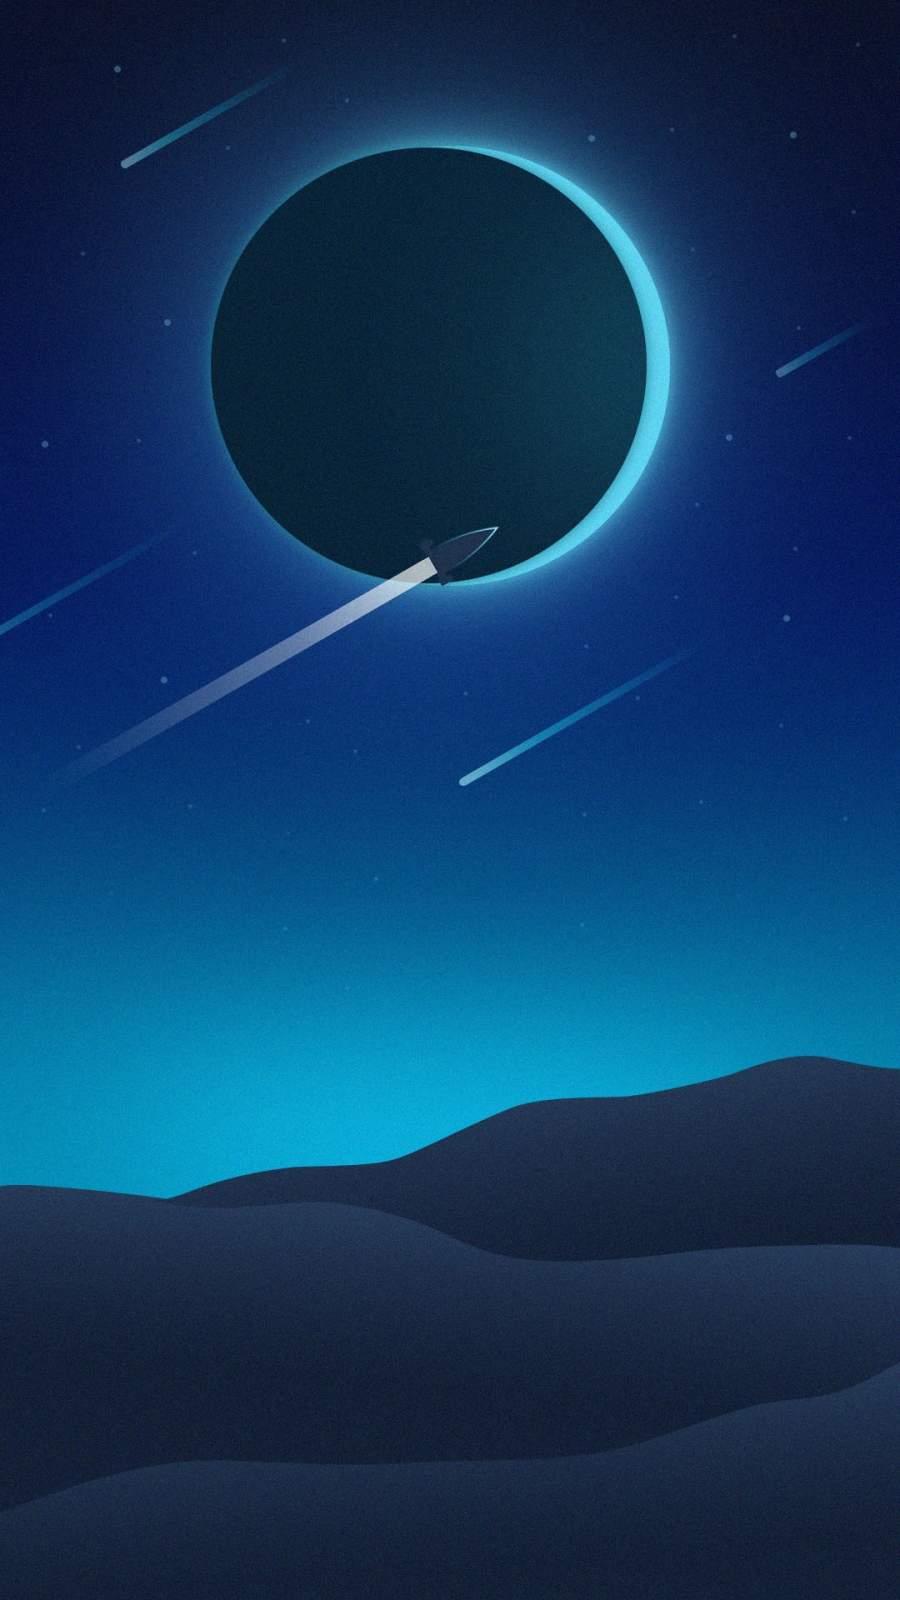 Moon Eclipse Minimalist iPhone Wallpaper